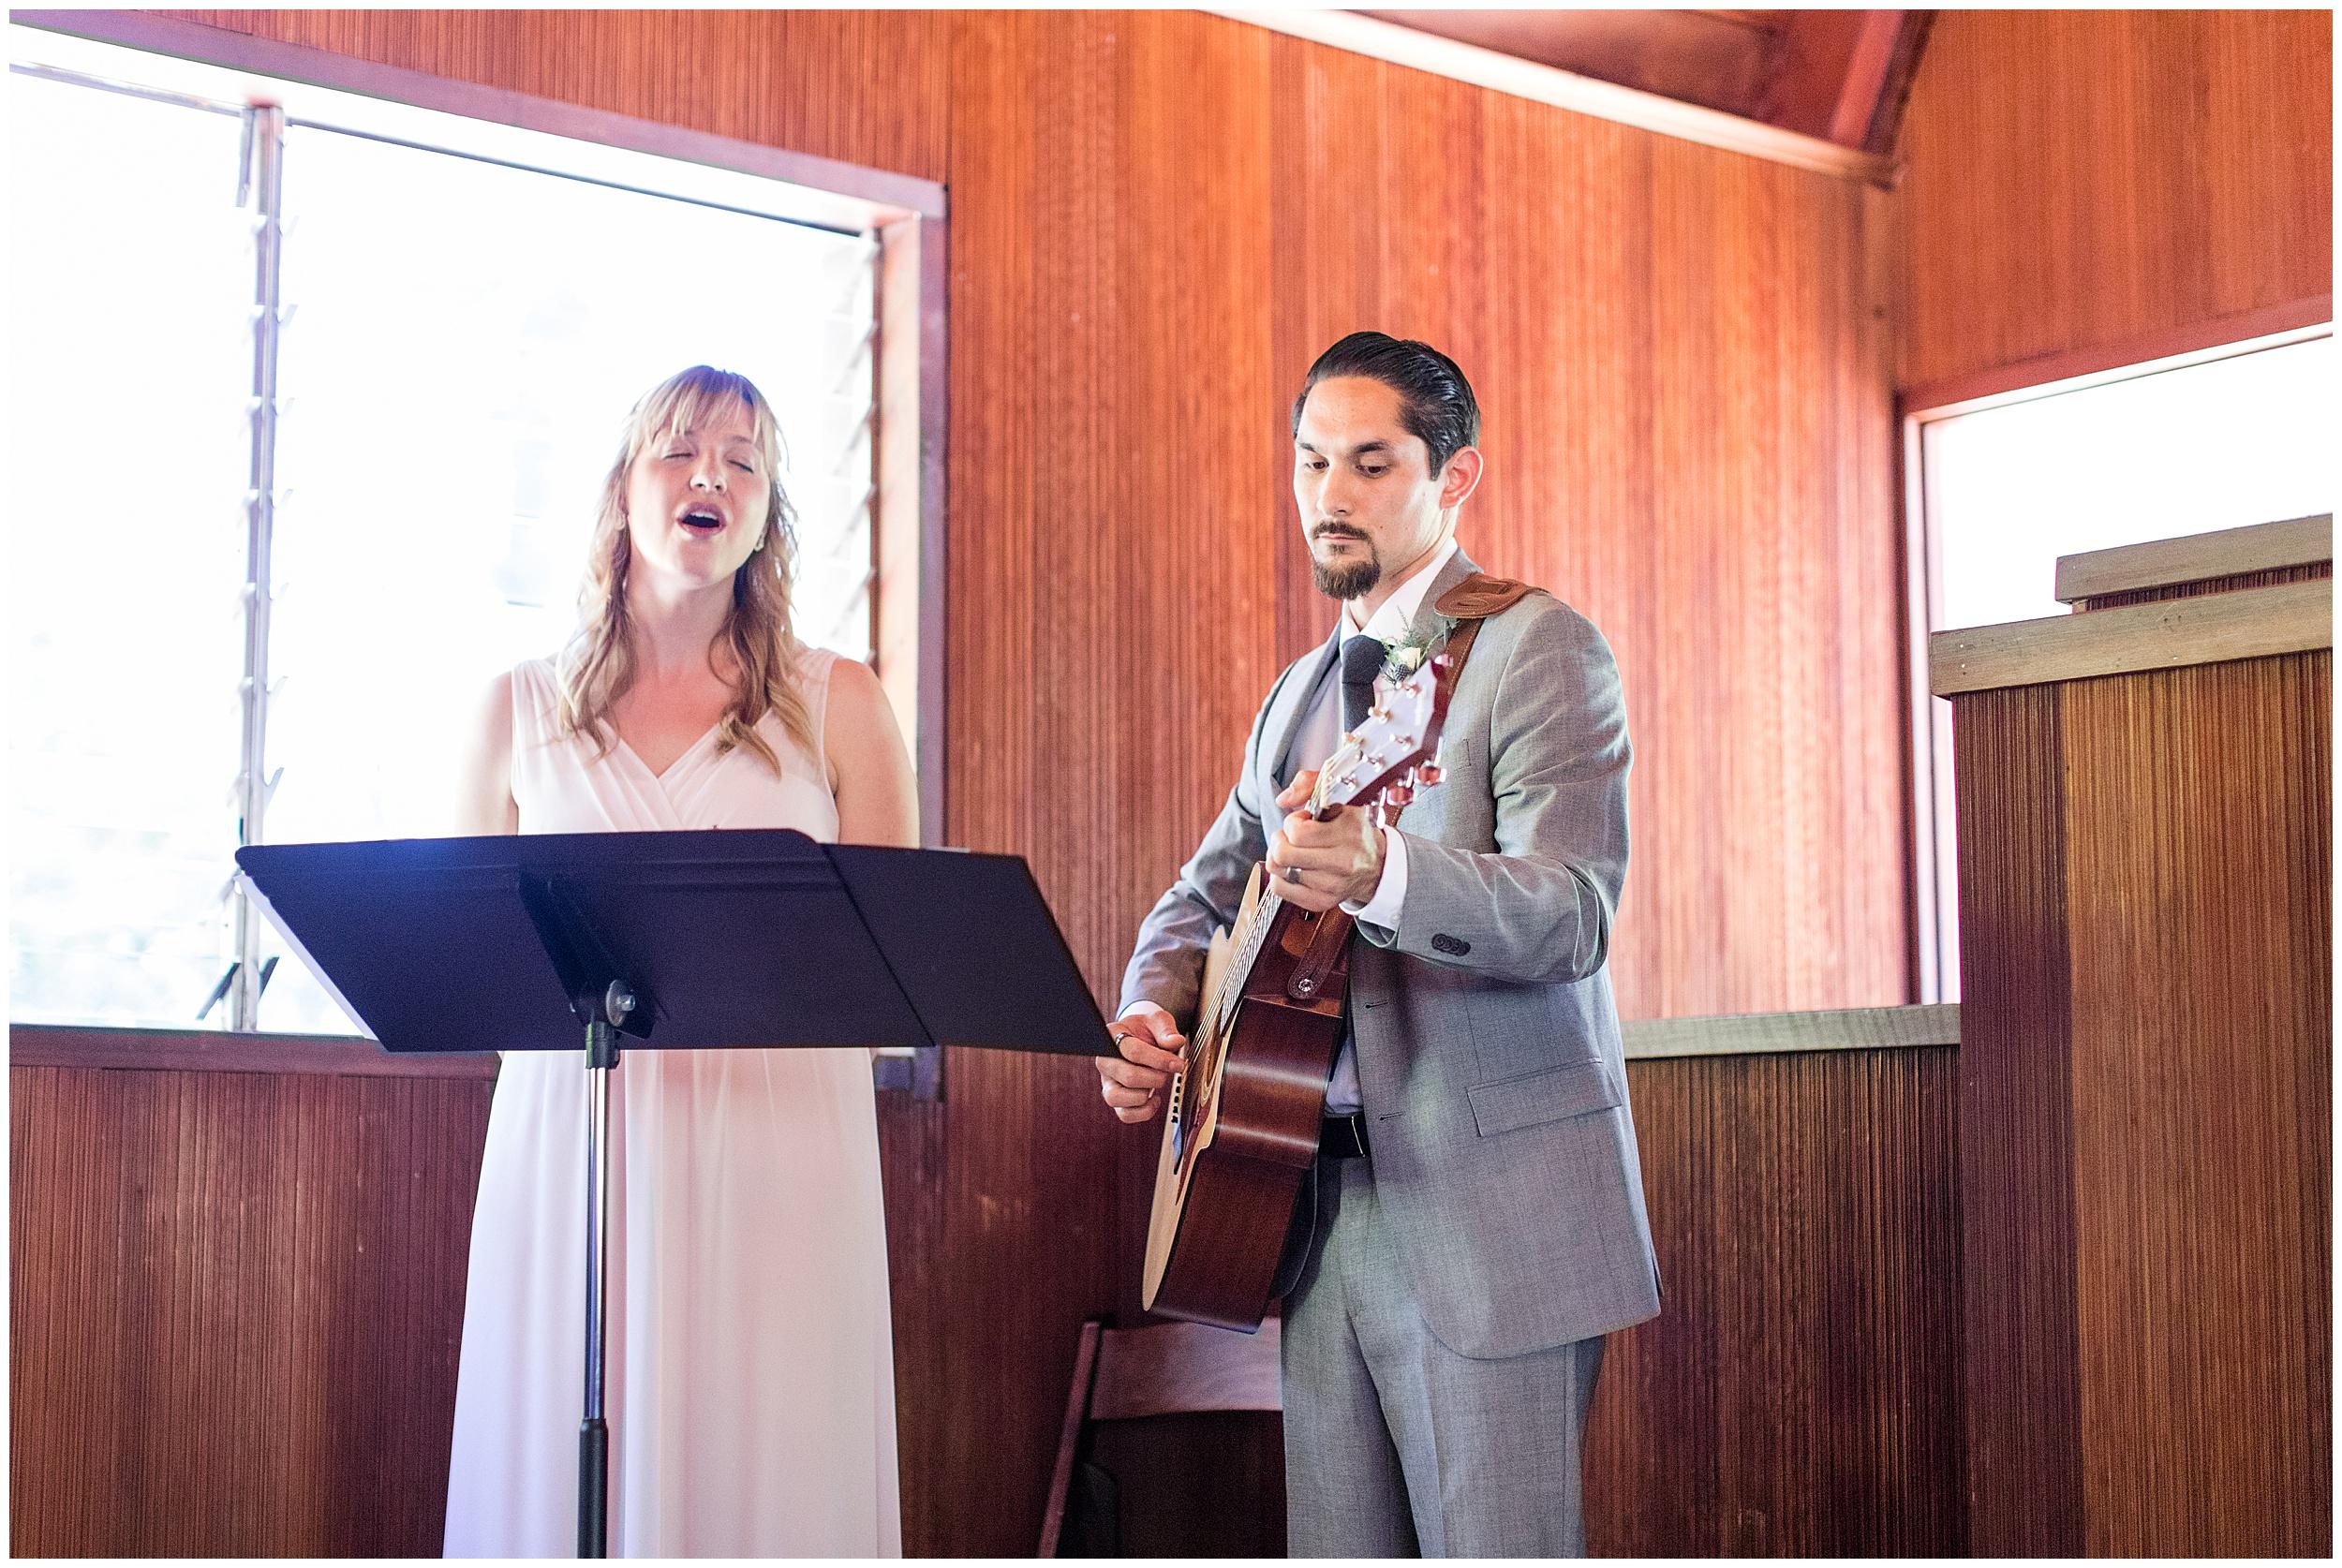 2019 chapel on the hill los gatos san jose bay area wedding photographer angela sue photography_0037.jpg